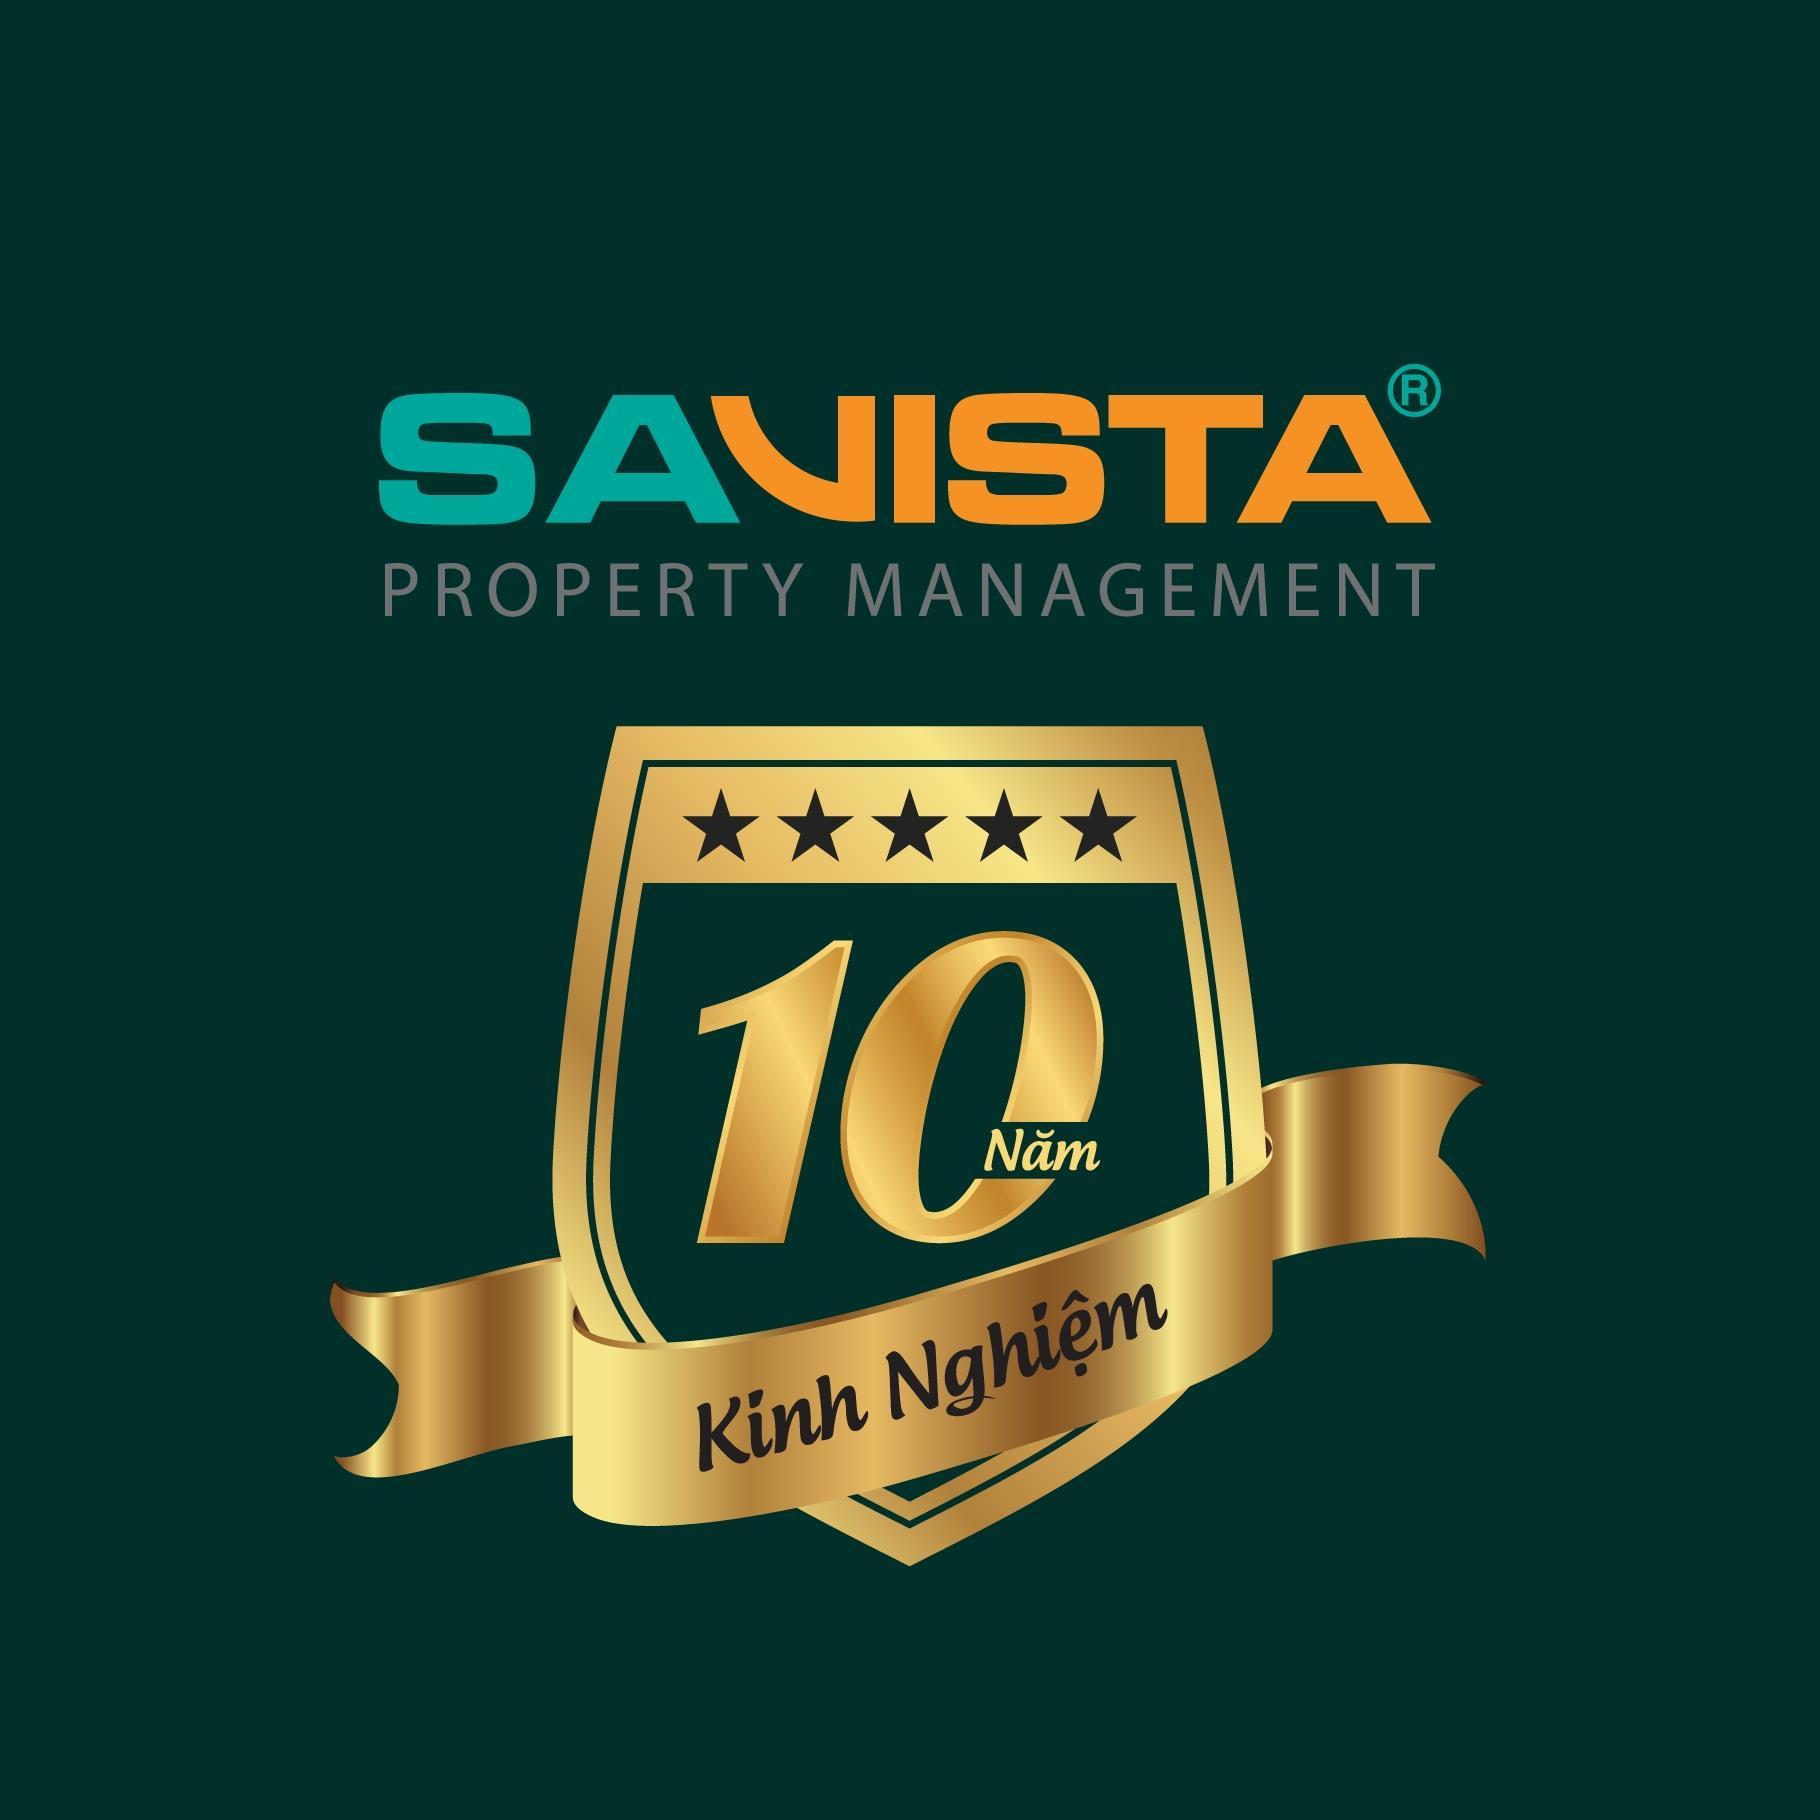 SAVISTA - cho thuê căn hộ